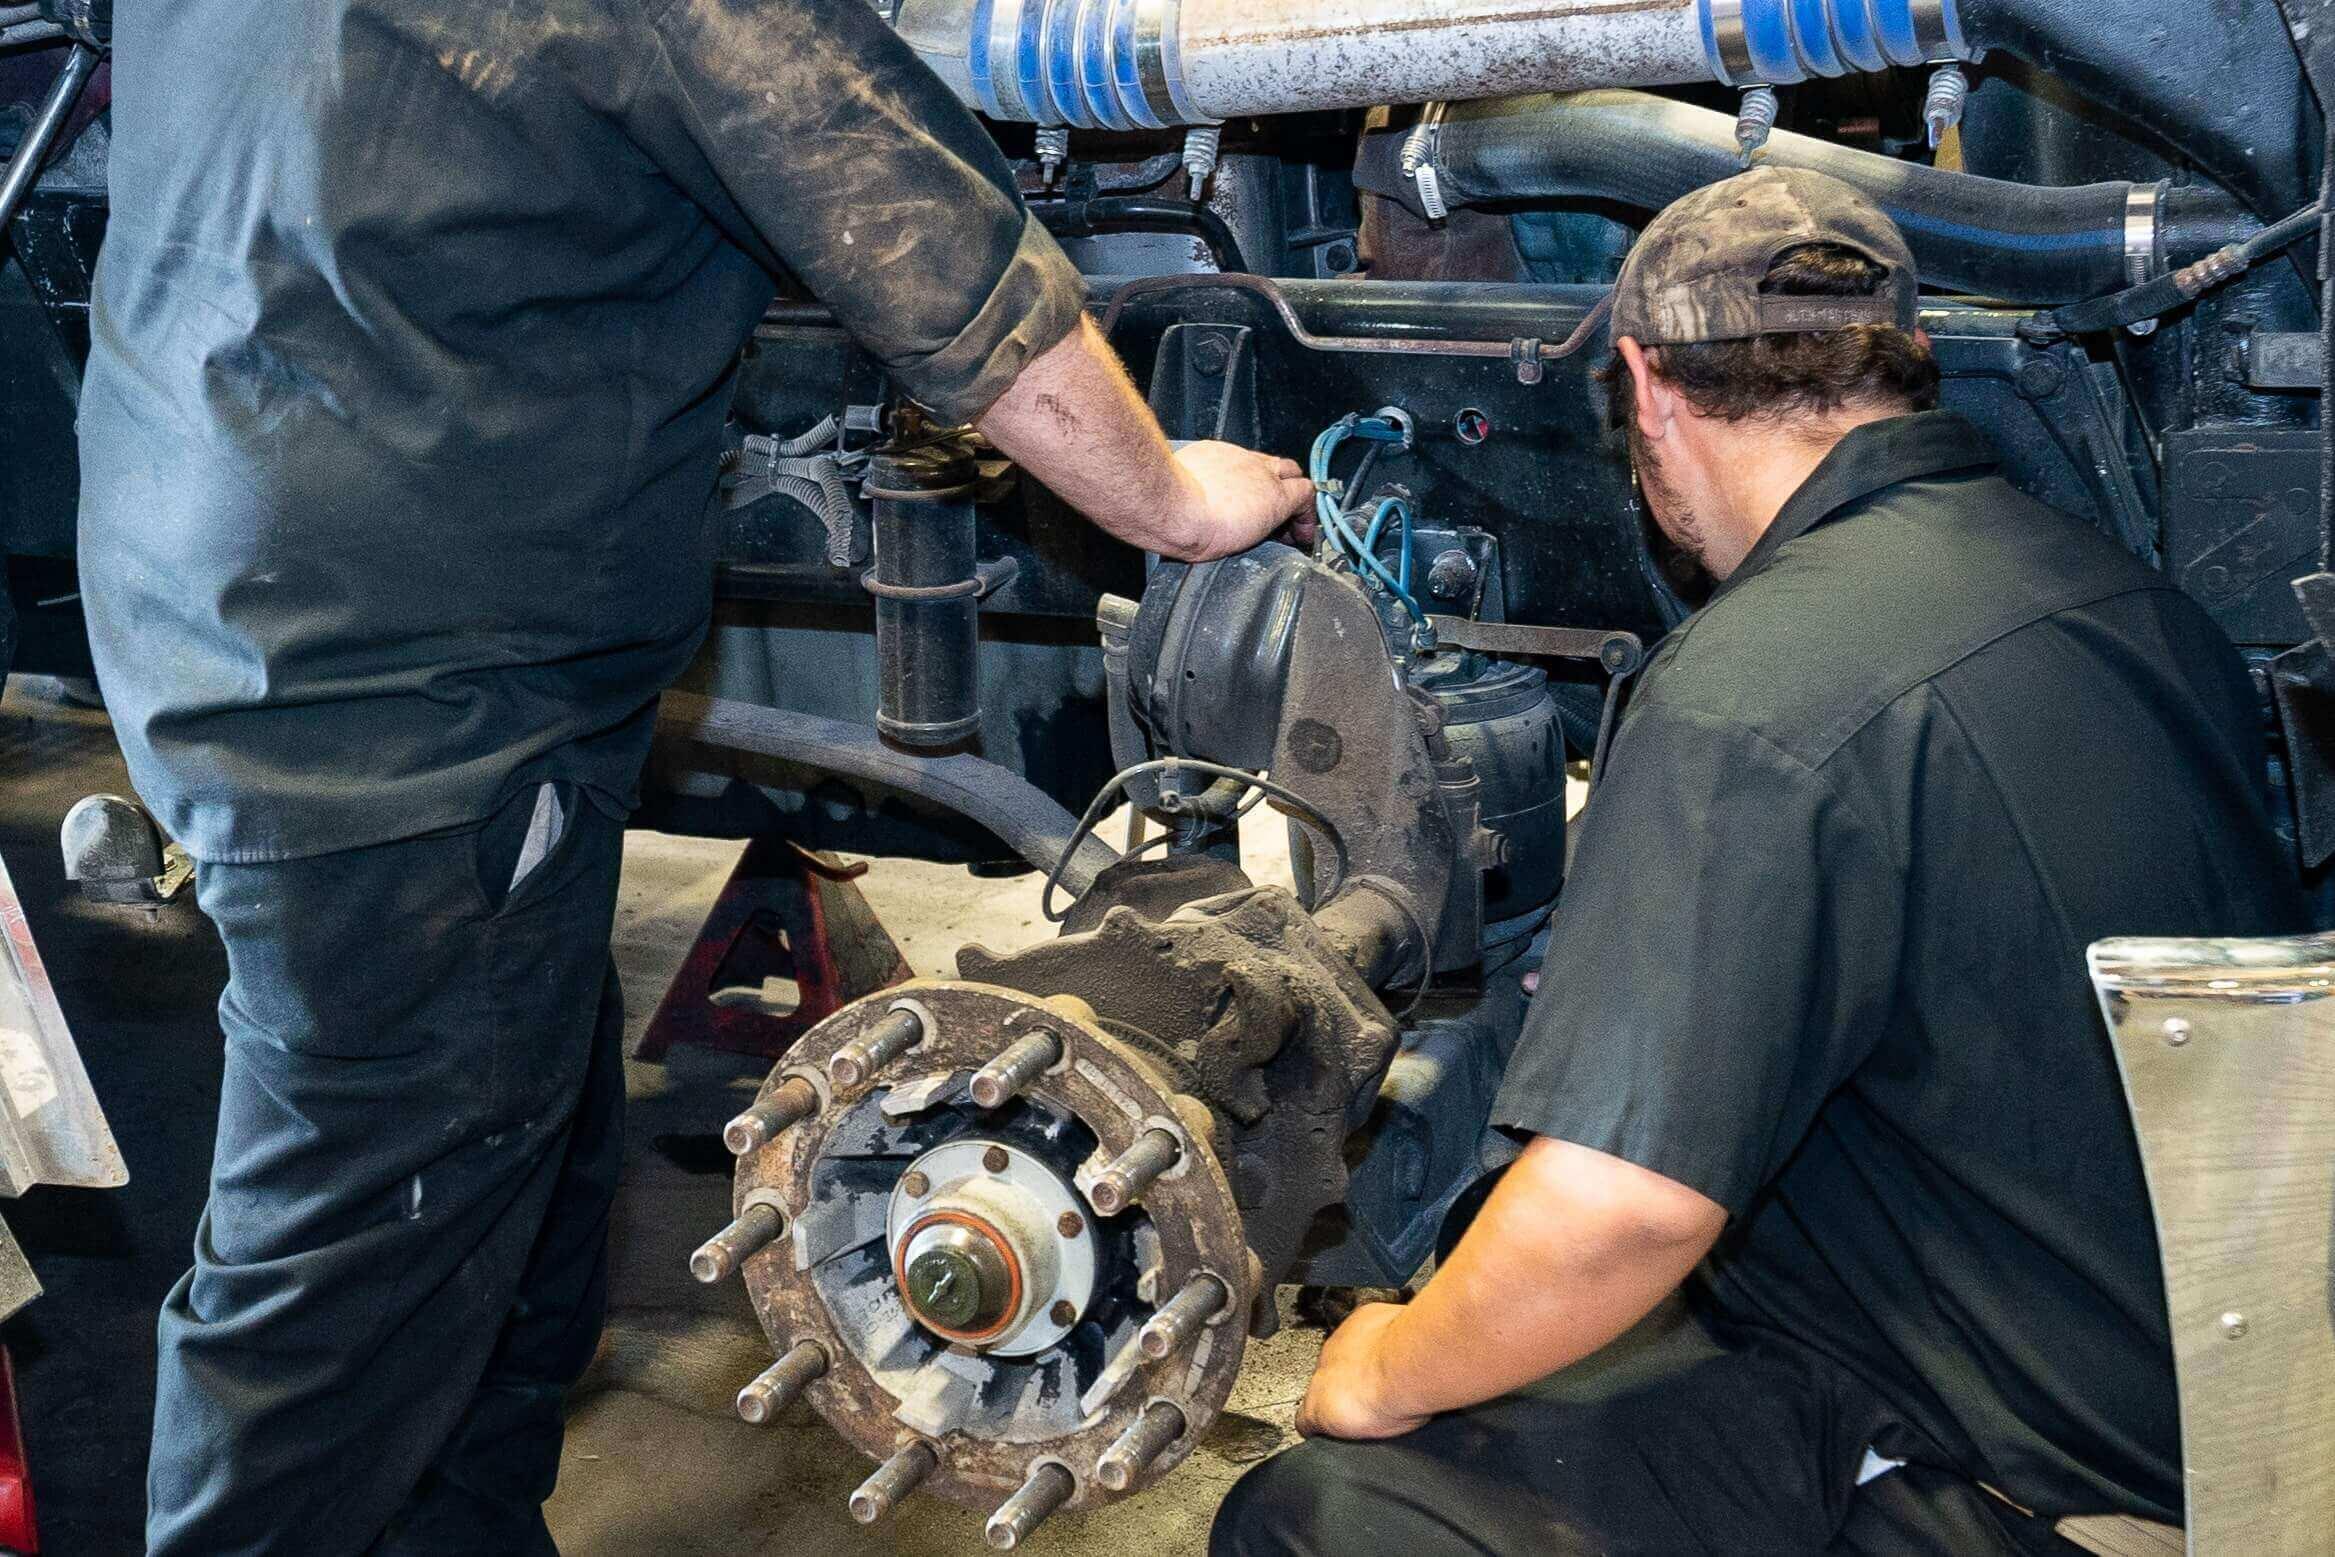 mechanic diesel training mechanics working certification east program completing tn while